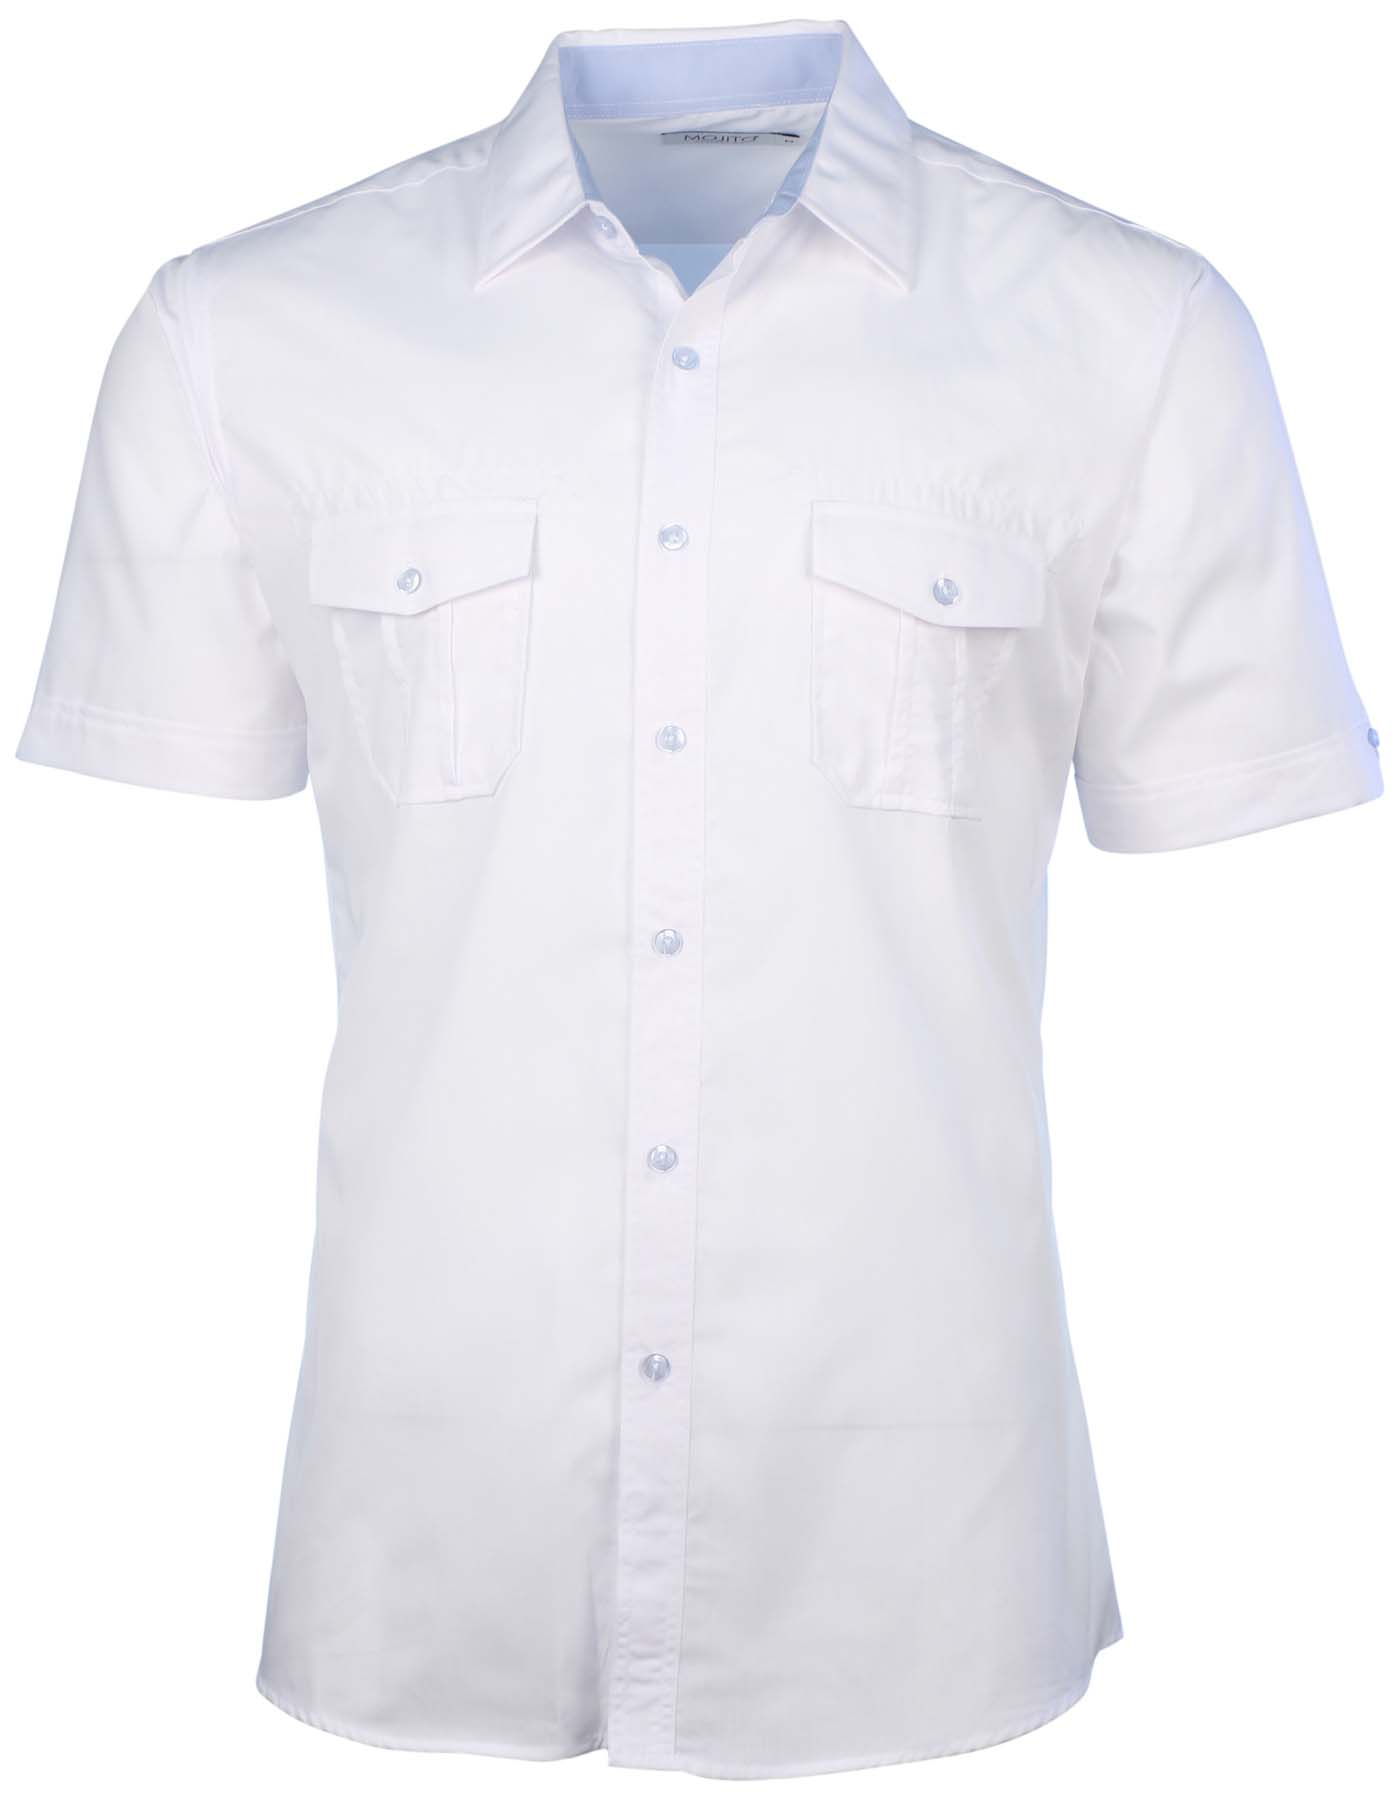 Mojito collection men 39 s 2 pocket short sleeve button down for Mens short sleeve button down shirts